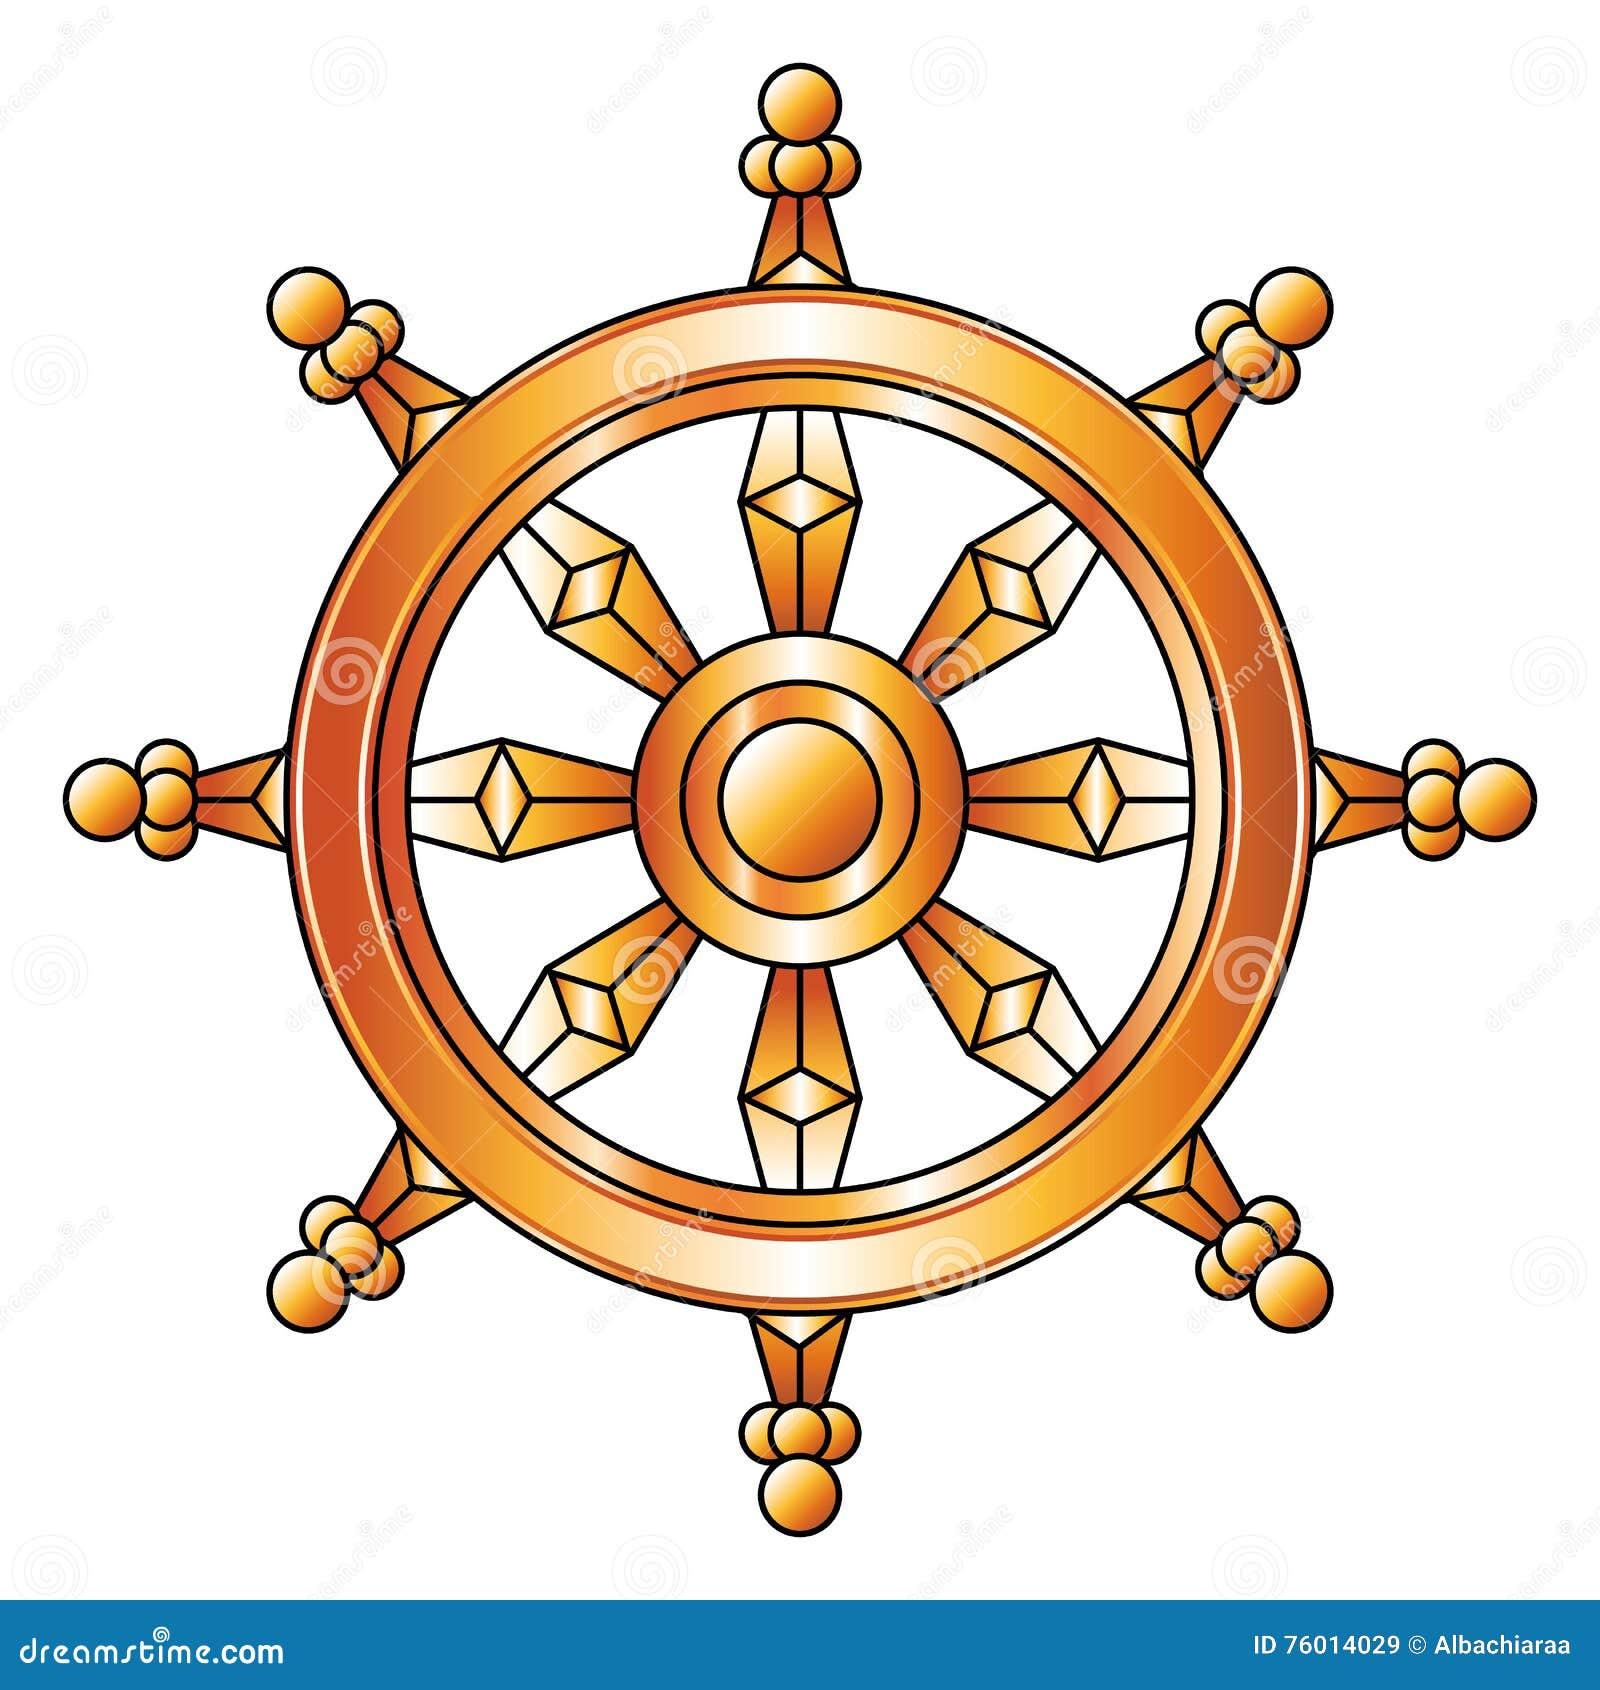 goldenes dharma rad buddhismus religions symbol vektor abbildung illustration 76014029. Black Bedroom Furniture Sets. Home Design Ideas